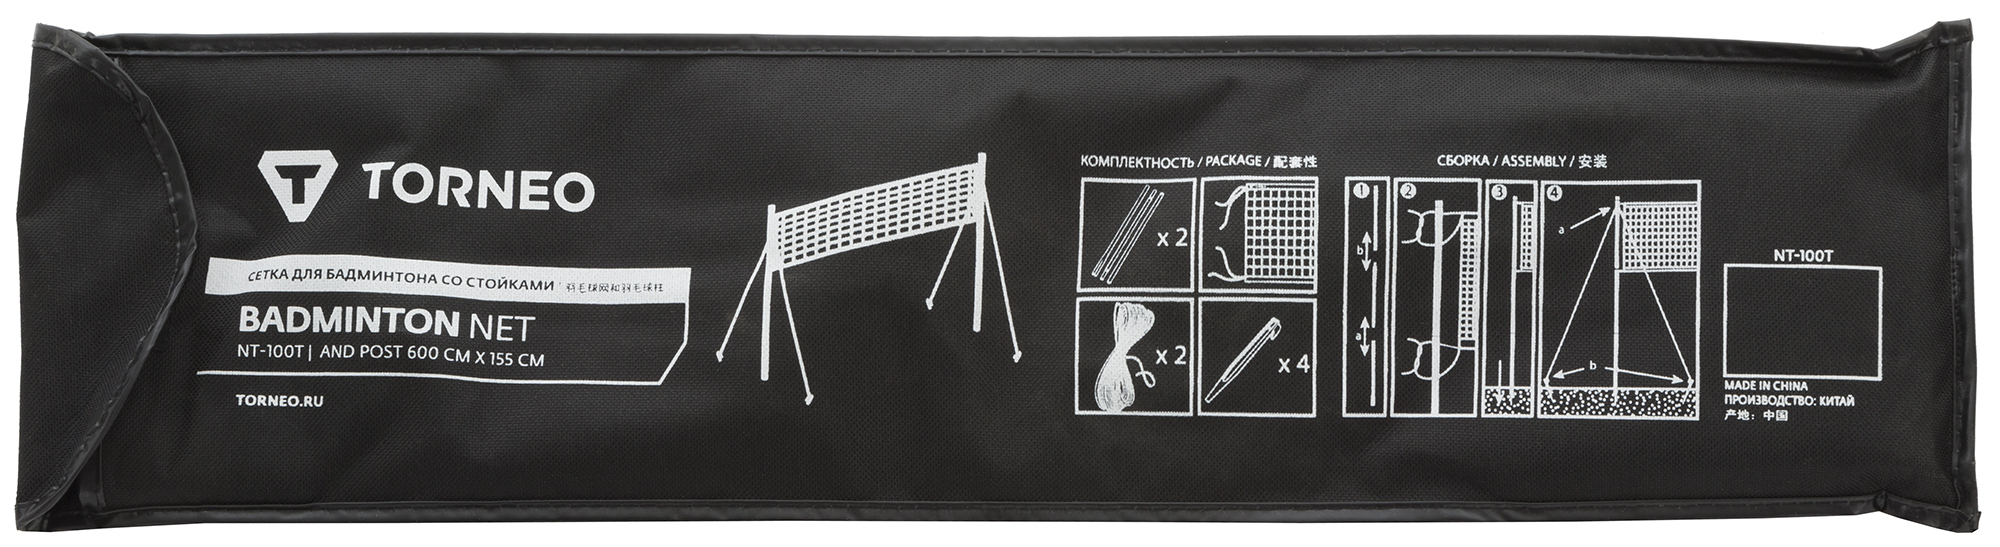 Torneo Сетка со стойками для бадминтона Torneo torneo набор для бадминтона torneo размер без размера